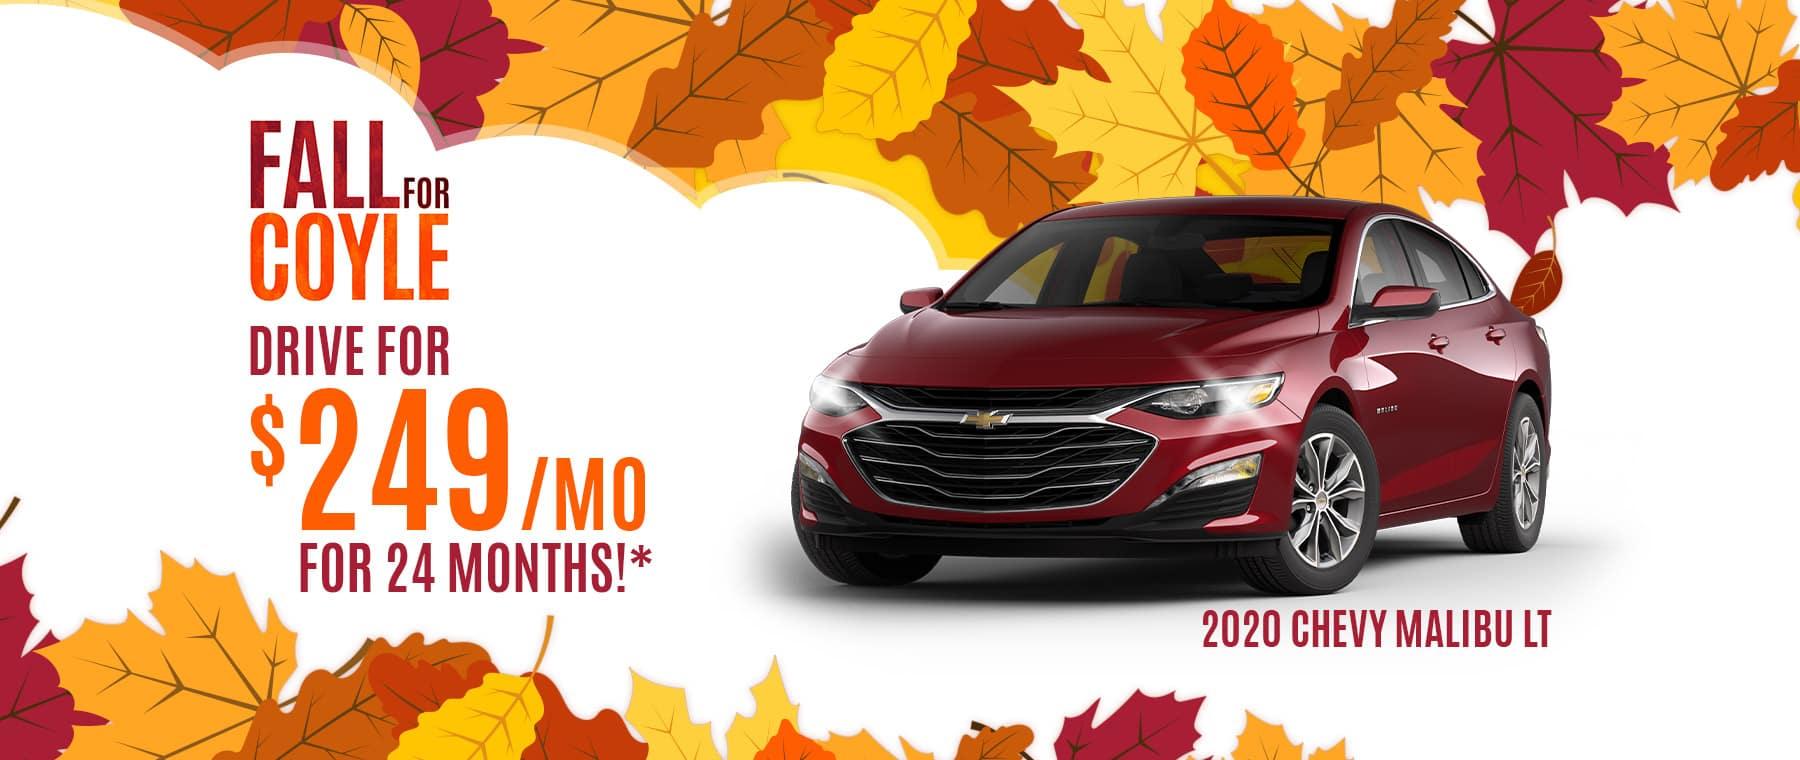 Best deal on a new Chevrolet Malibu near Louisville, Kentucky